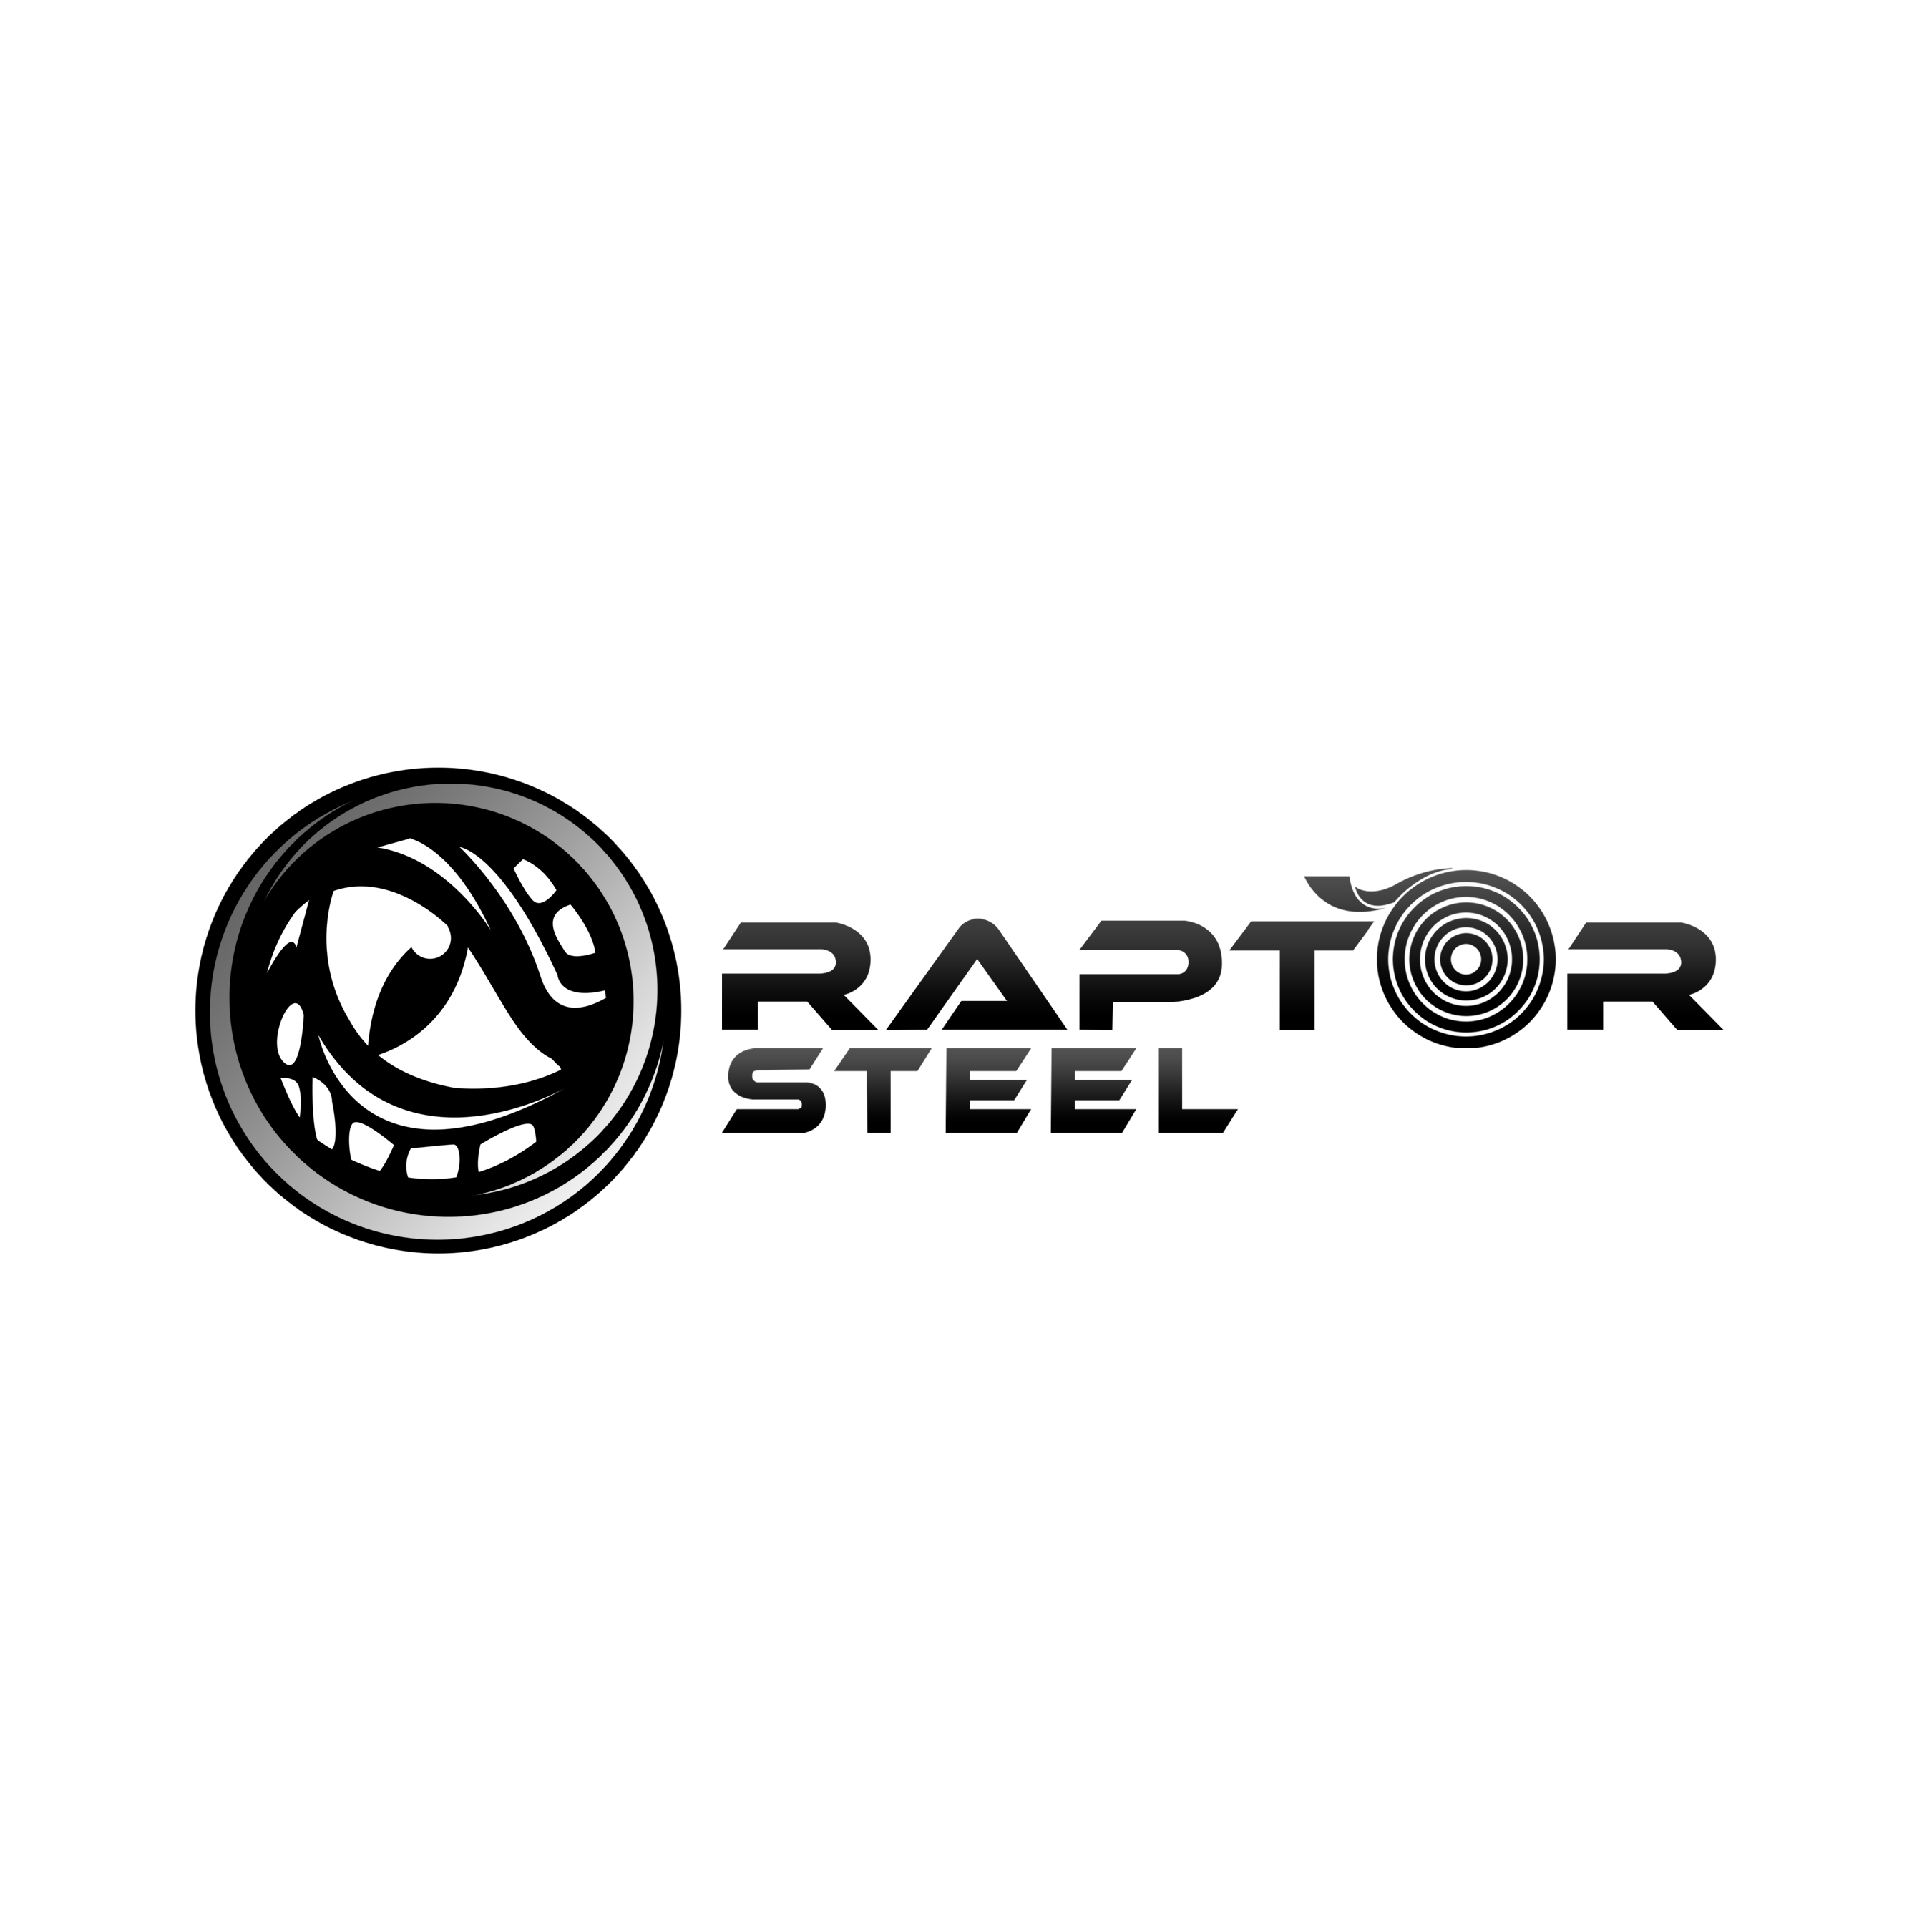 Raptor Steel needs a powerful new logo